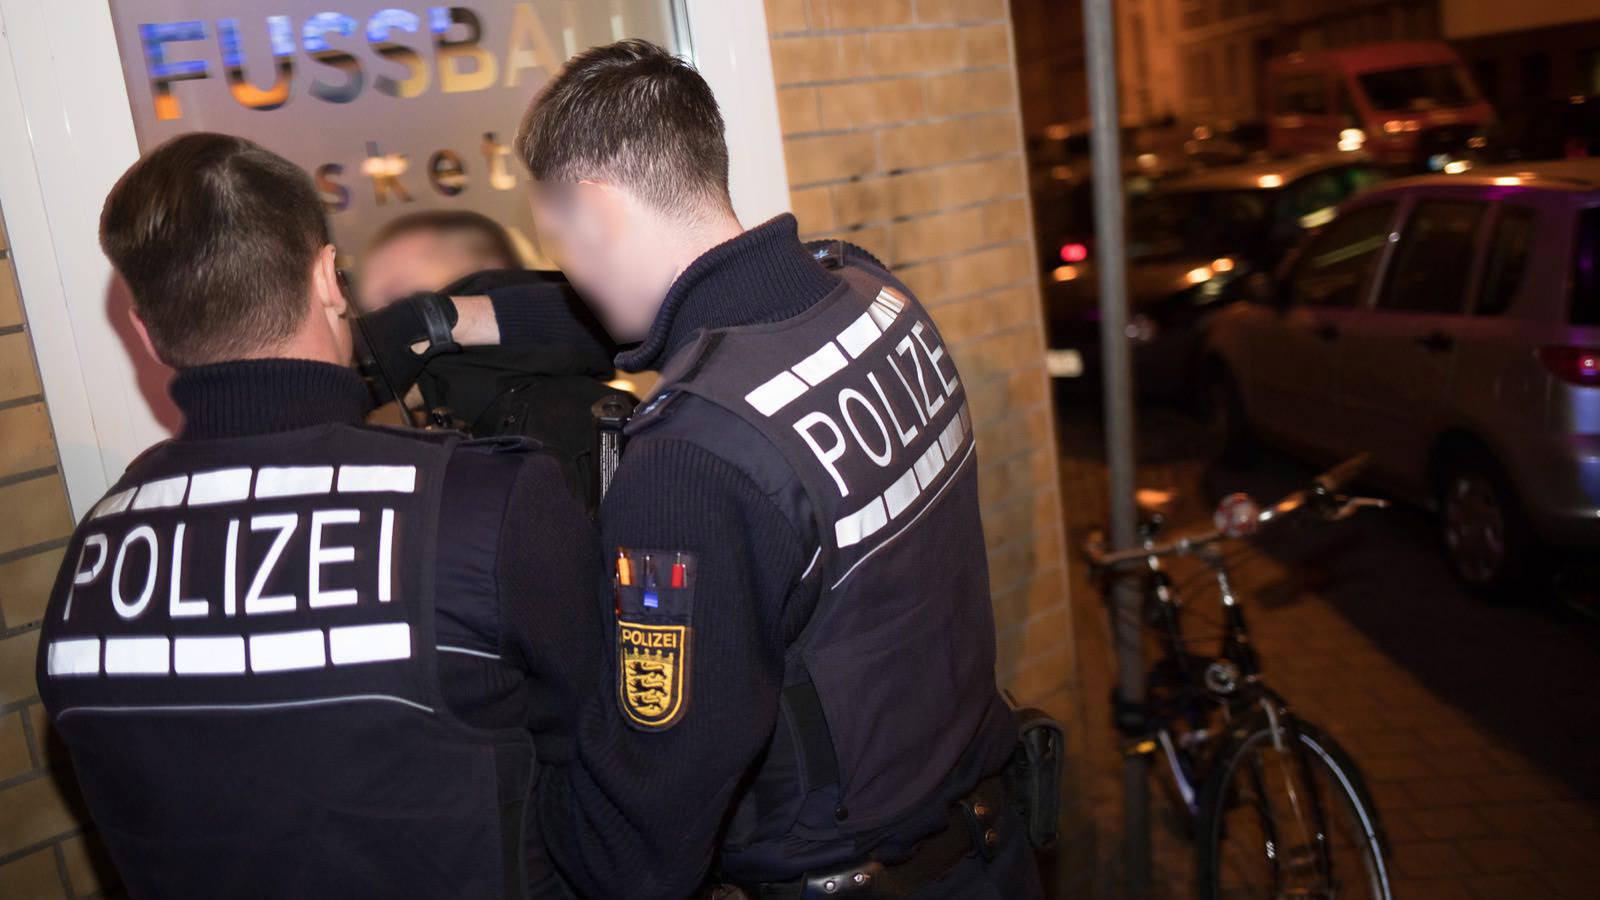 Der Beschuldigte wird an der Ecke Pflügersgrundstraße an der Wand fixiert. Später wird er in das Wettbüro geschleppt | Foto: CKI